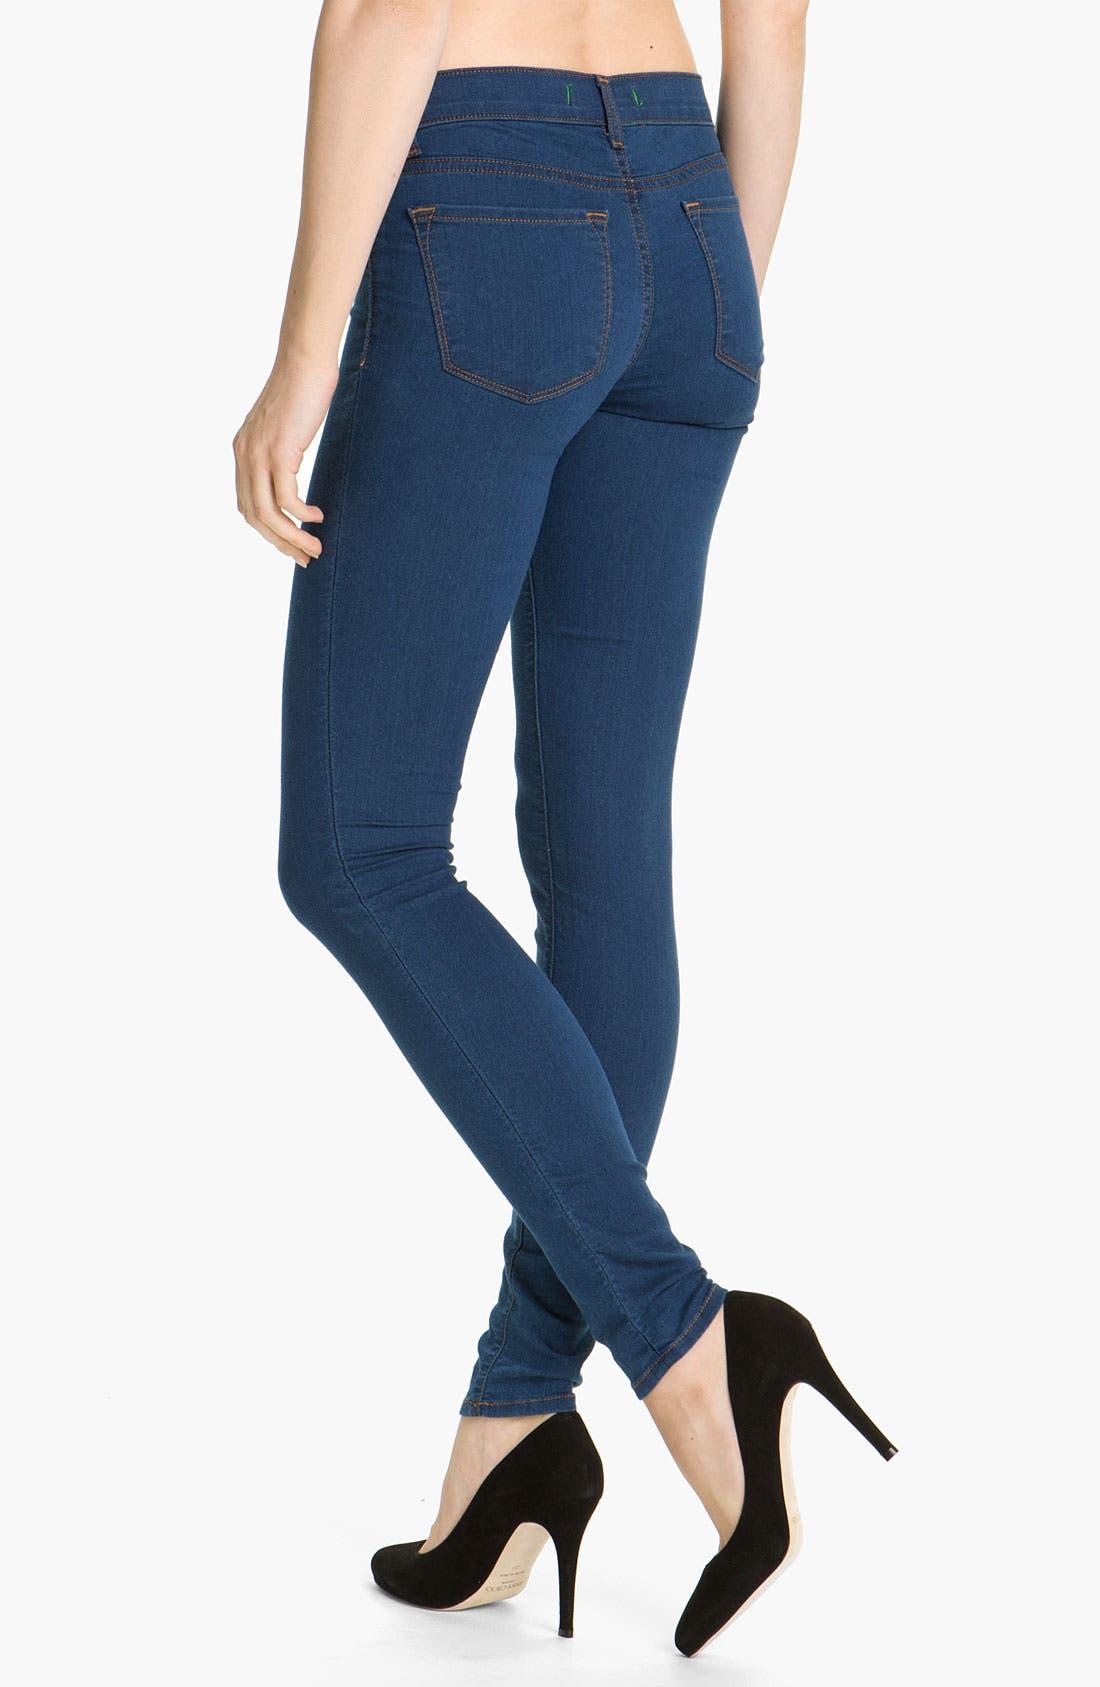 Alternate Image 3  - J Brand 'Legging' Stretch Jeans (Salton)